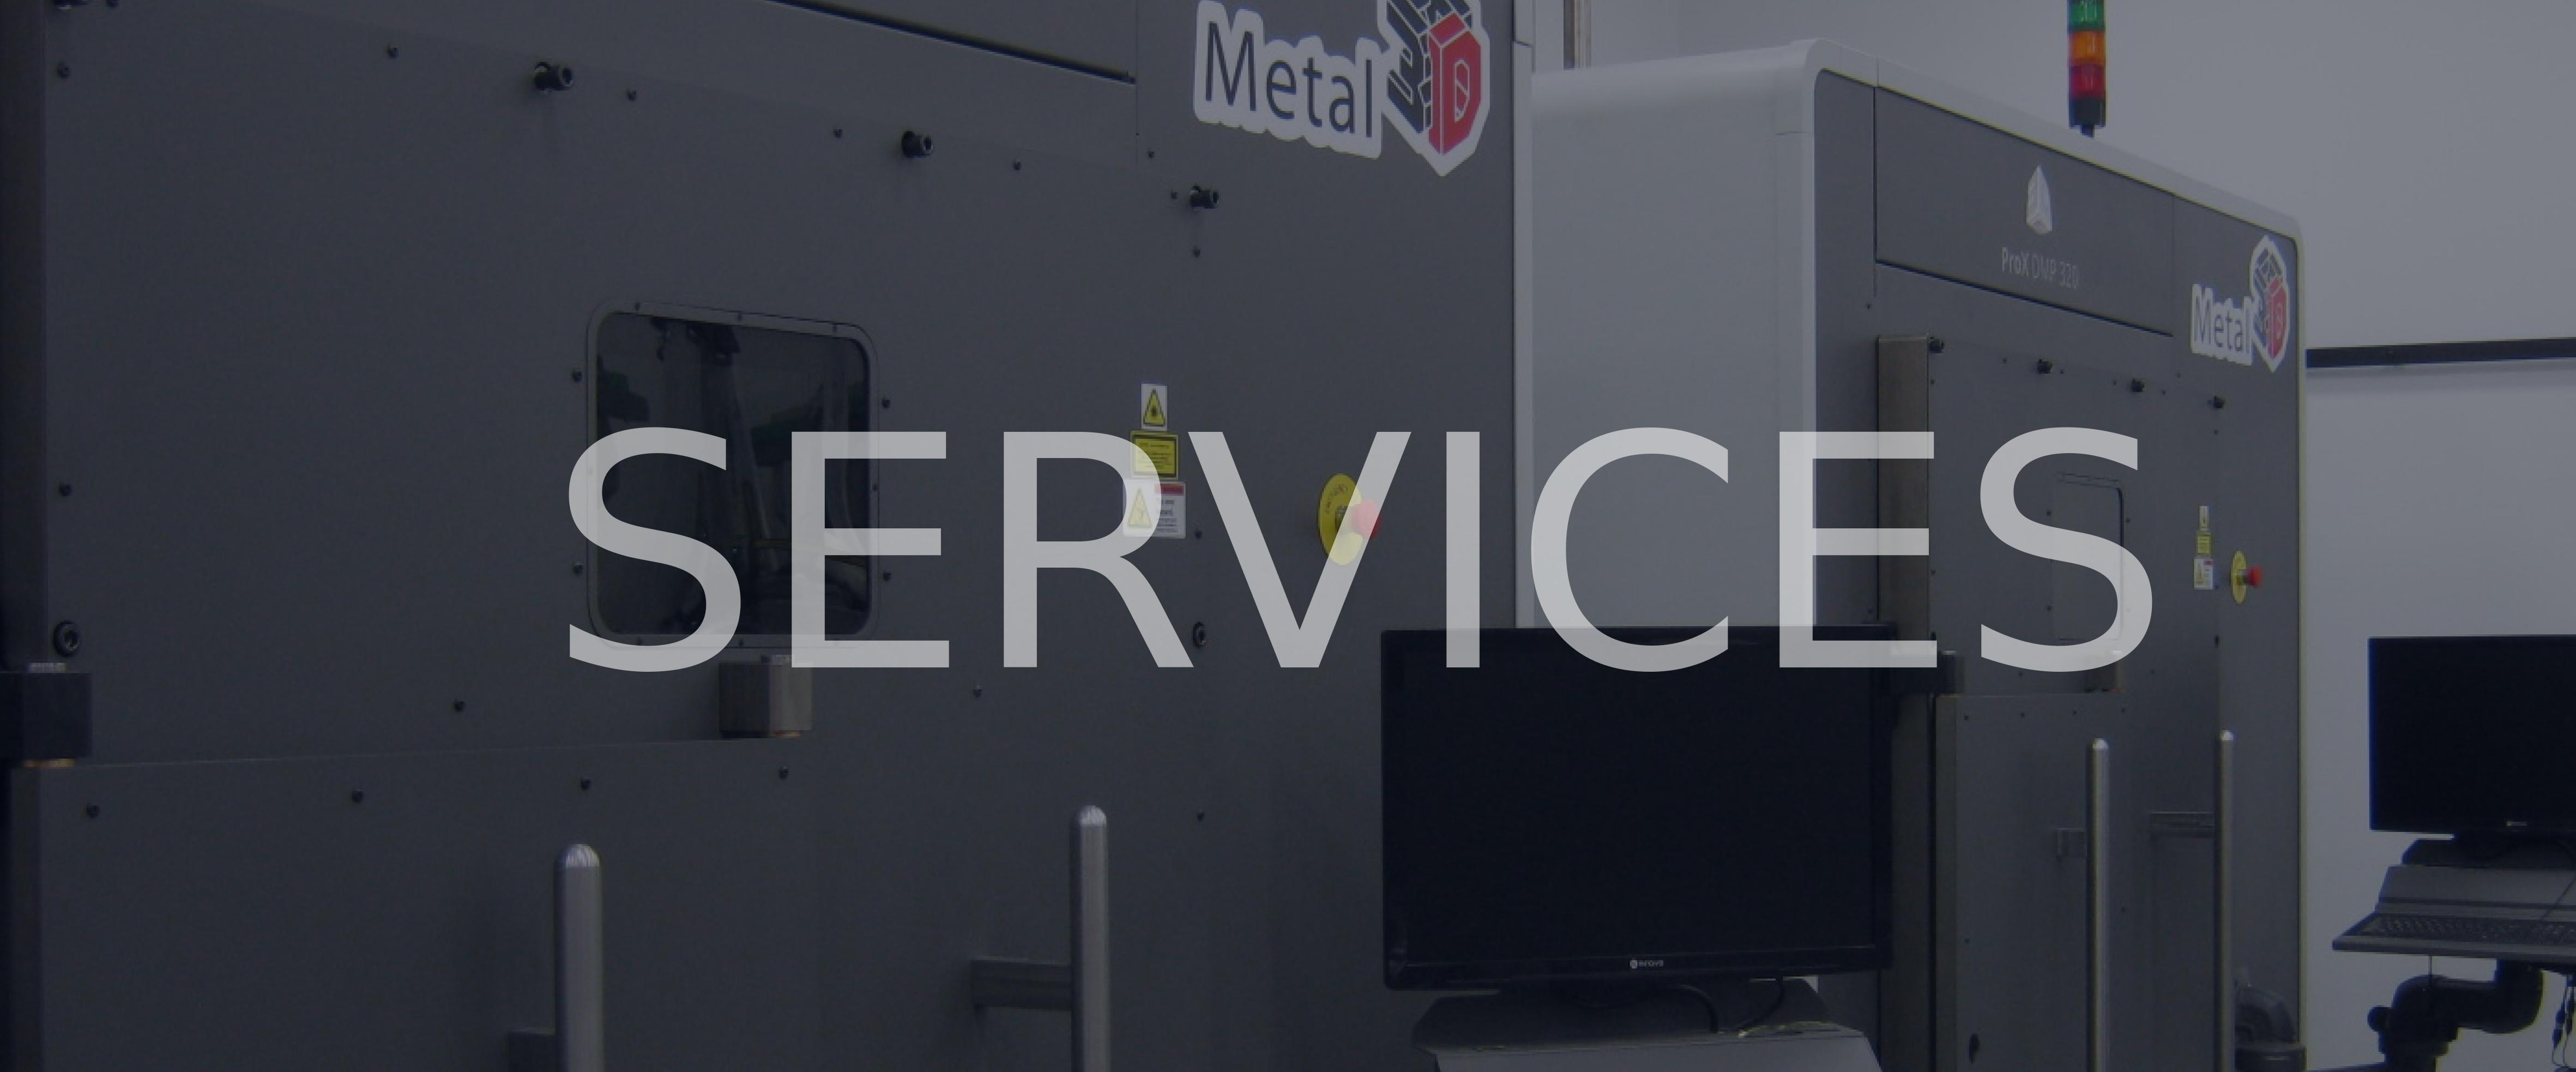 metal 3d printing services